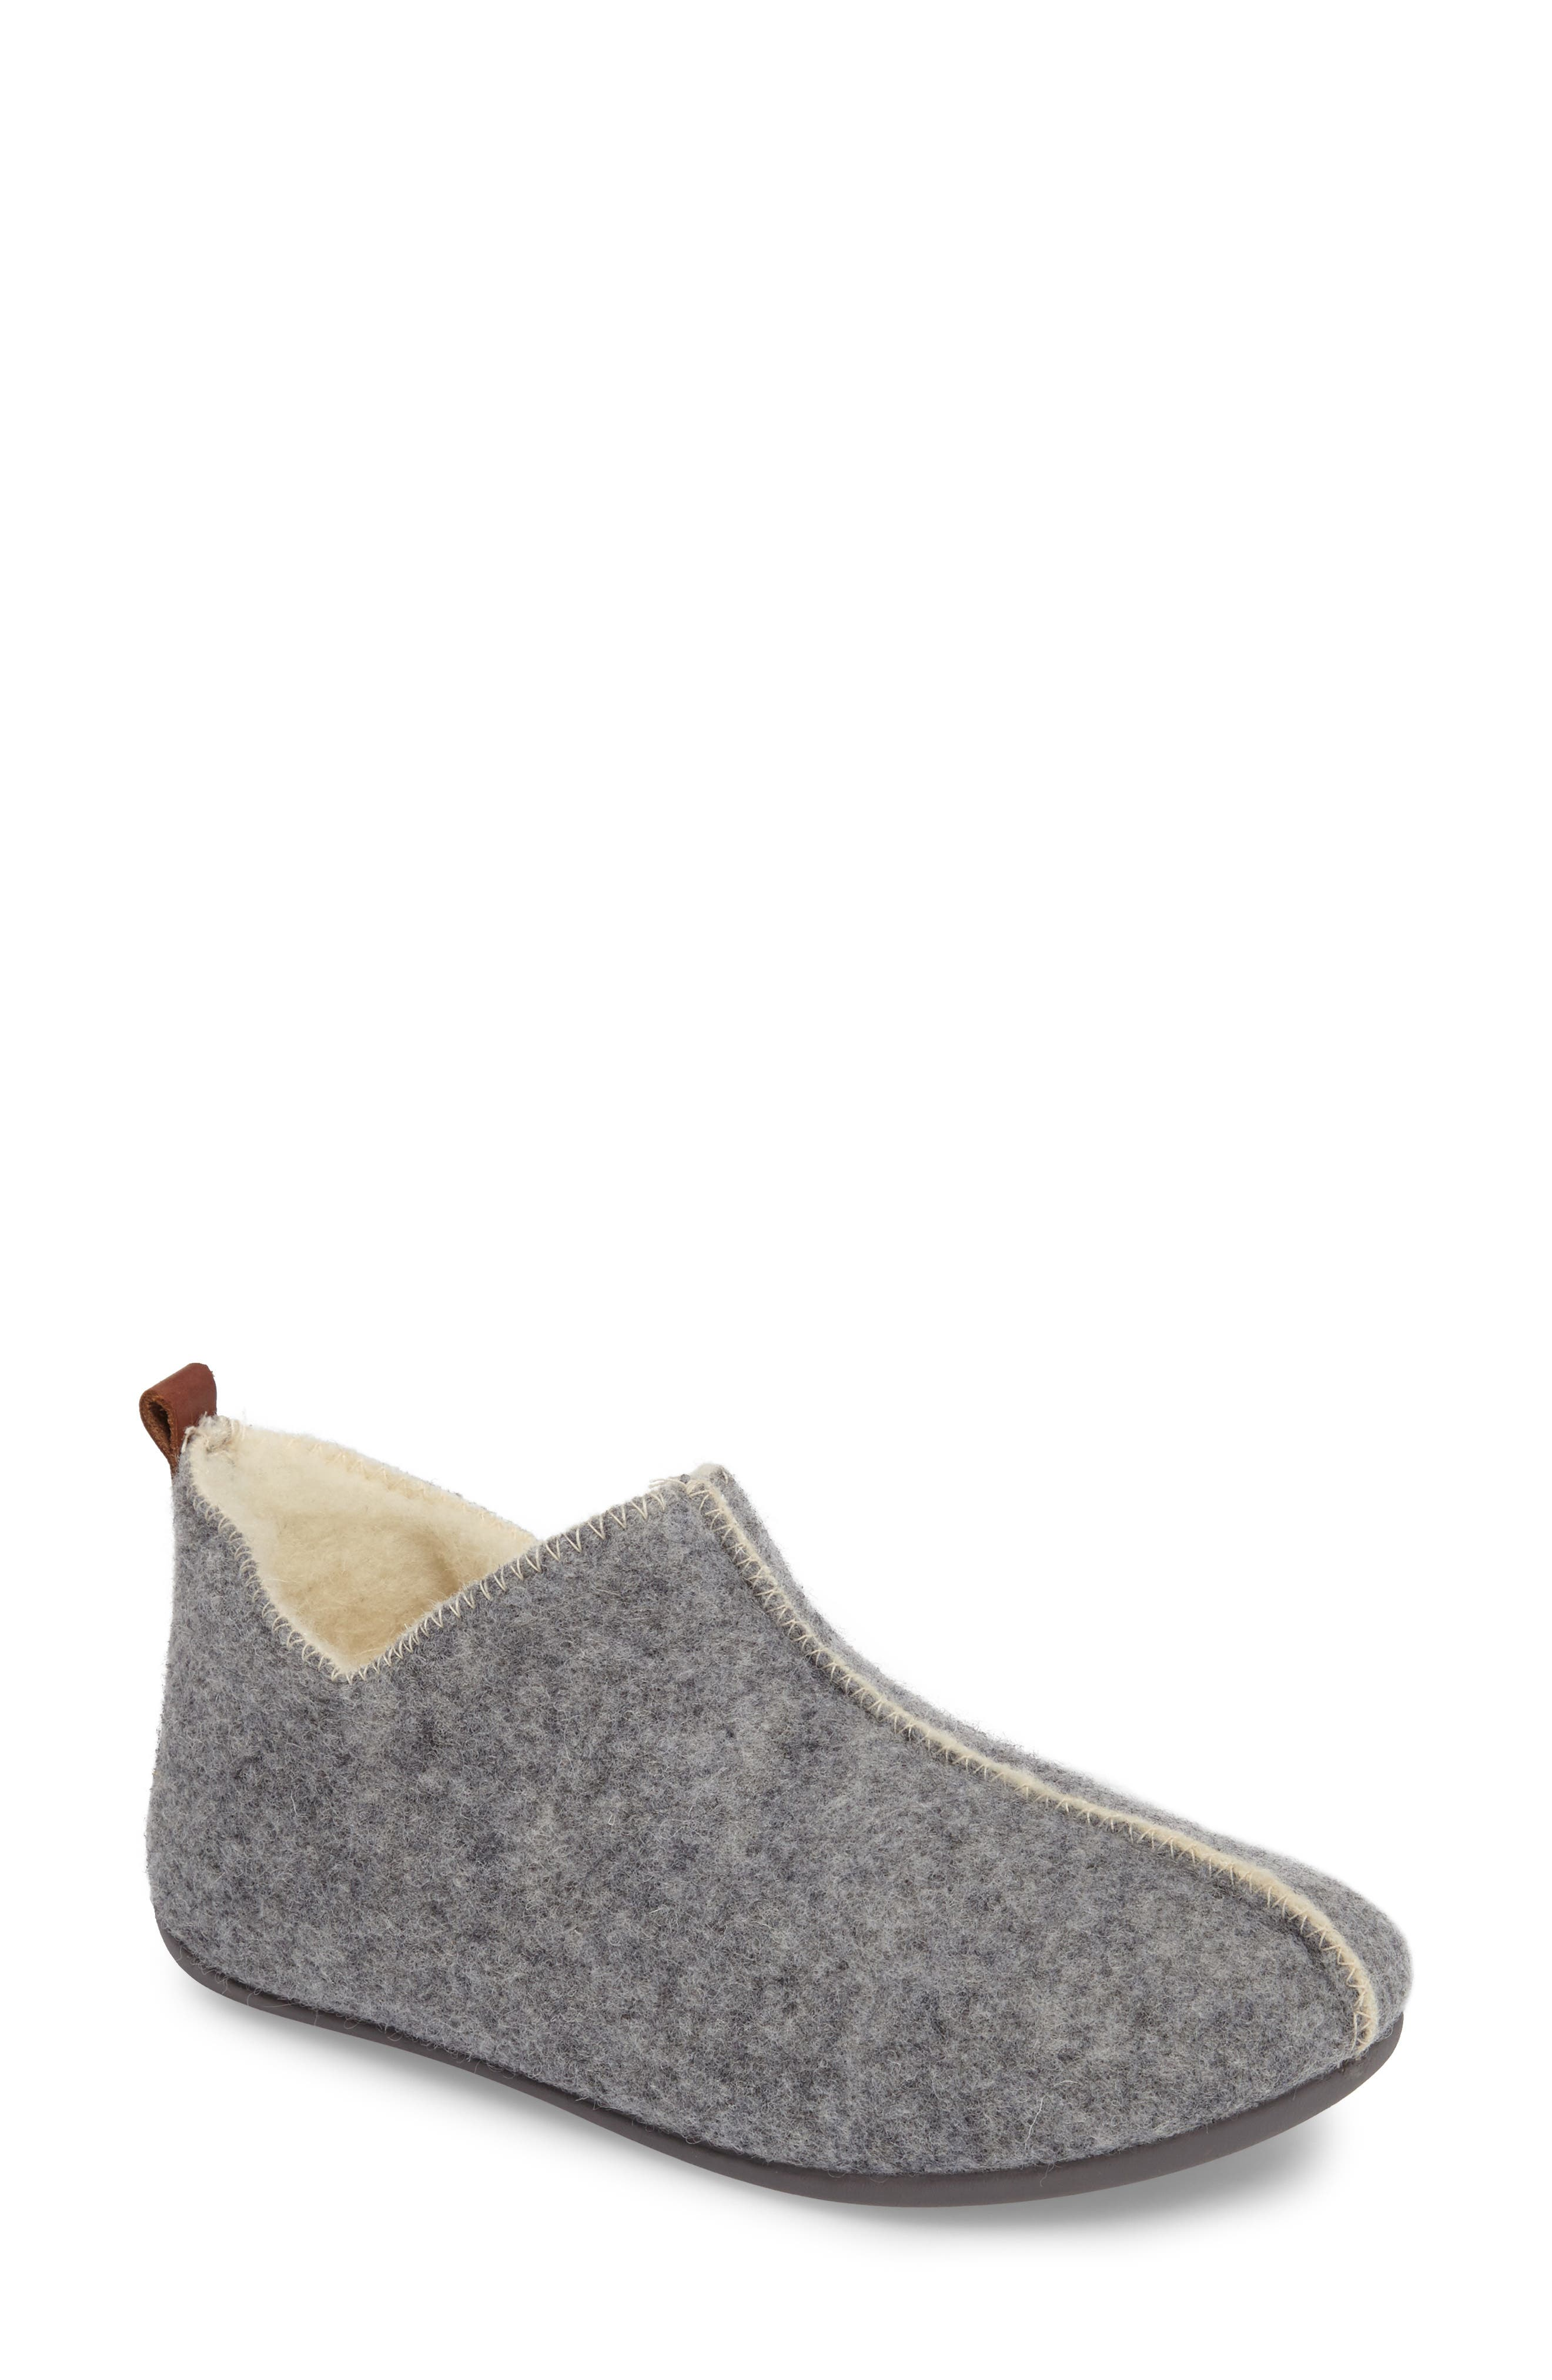 Lila Slipper,                             Main thumbnail 1, color,                             Grey Fabric